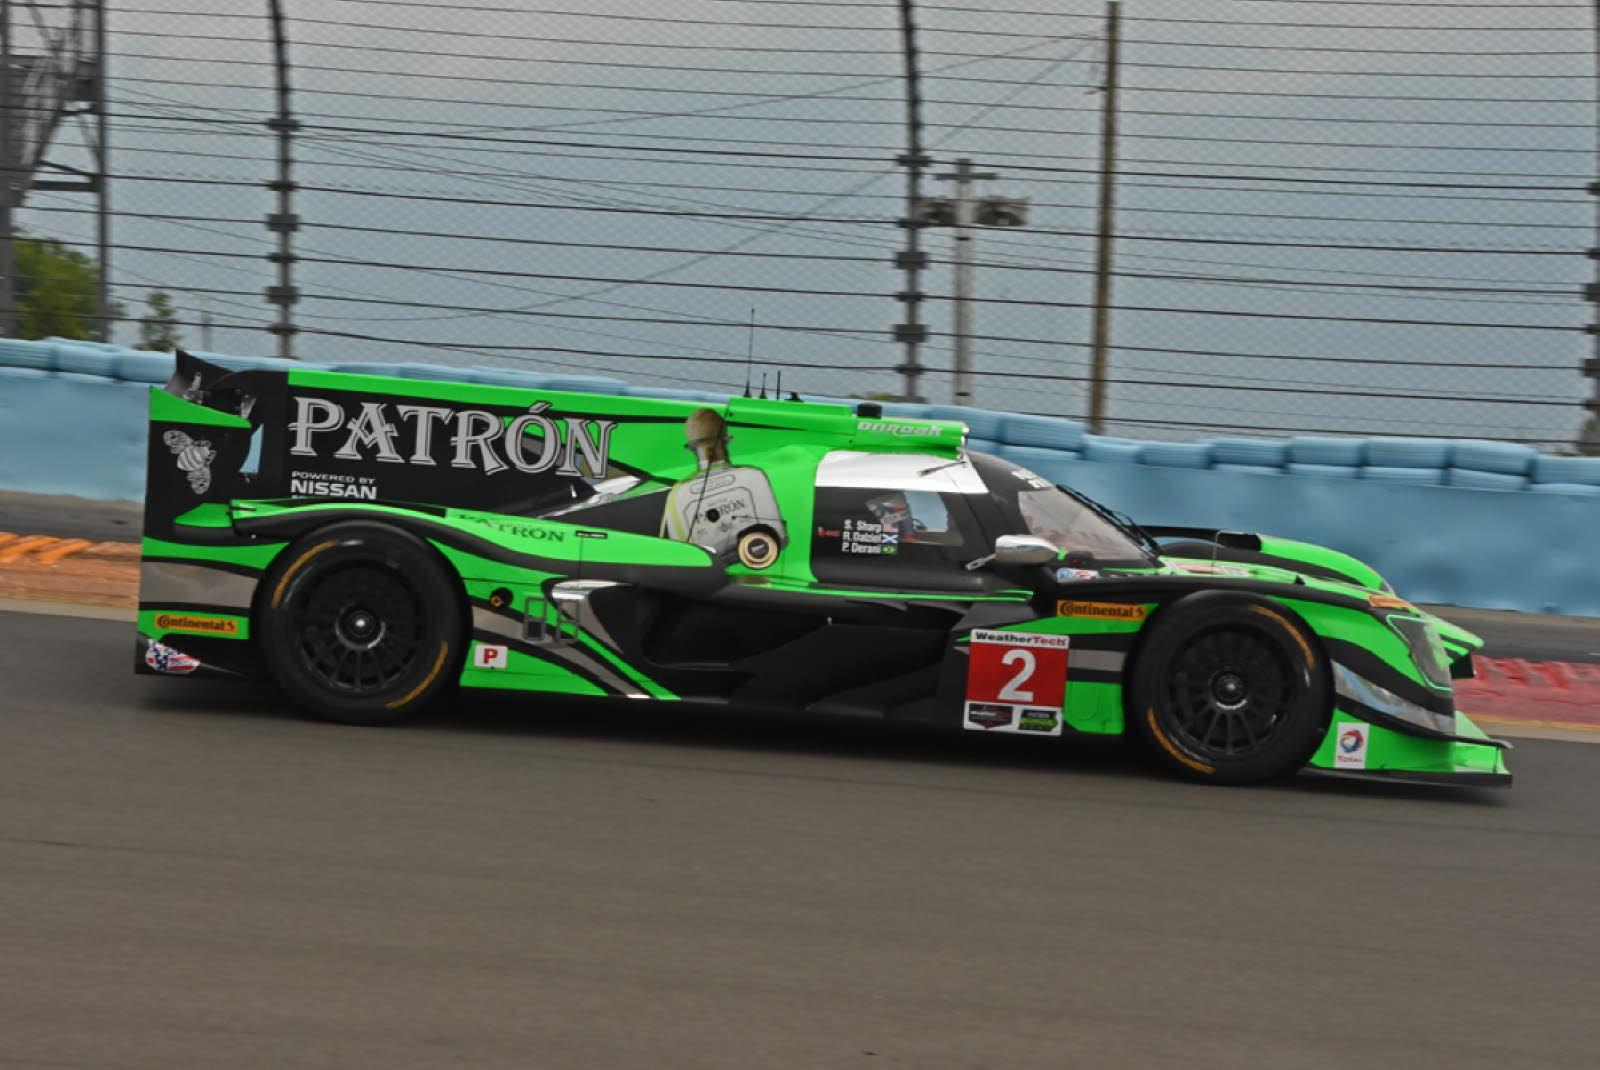 Pole Winning Tequila Patron Nissan speeds around track. [Joe Jennings Photo]